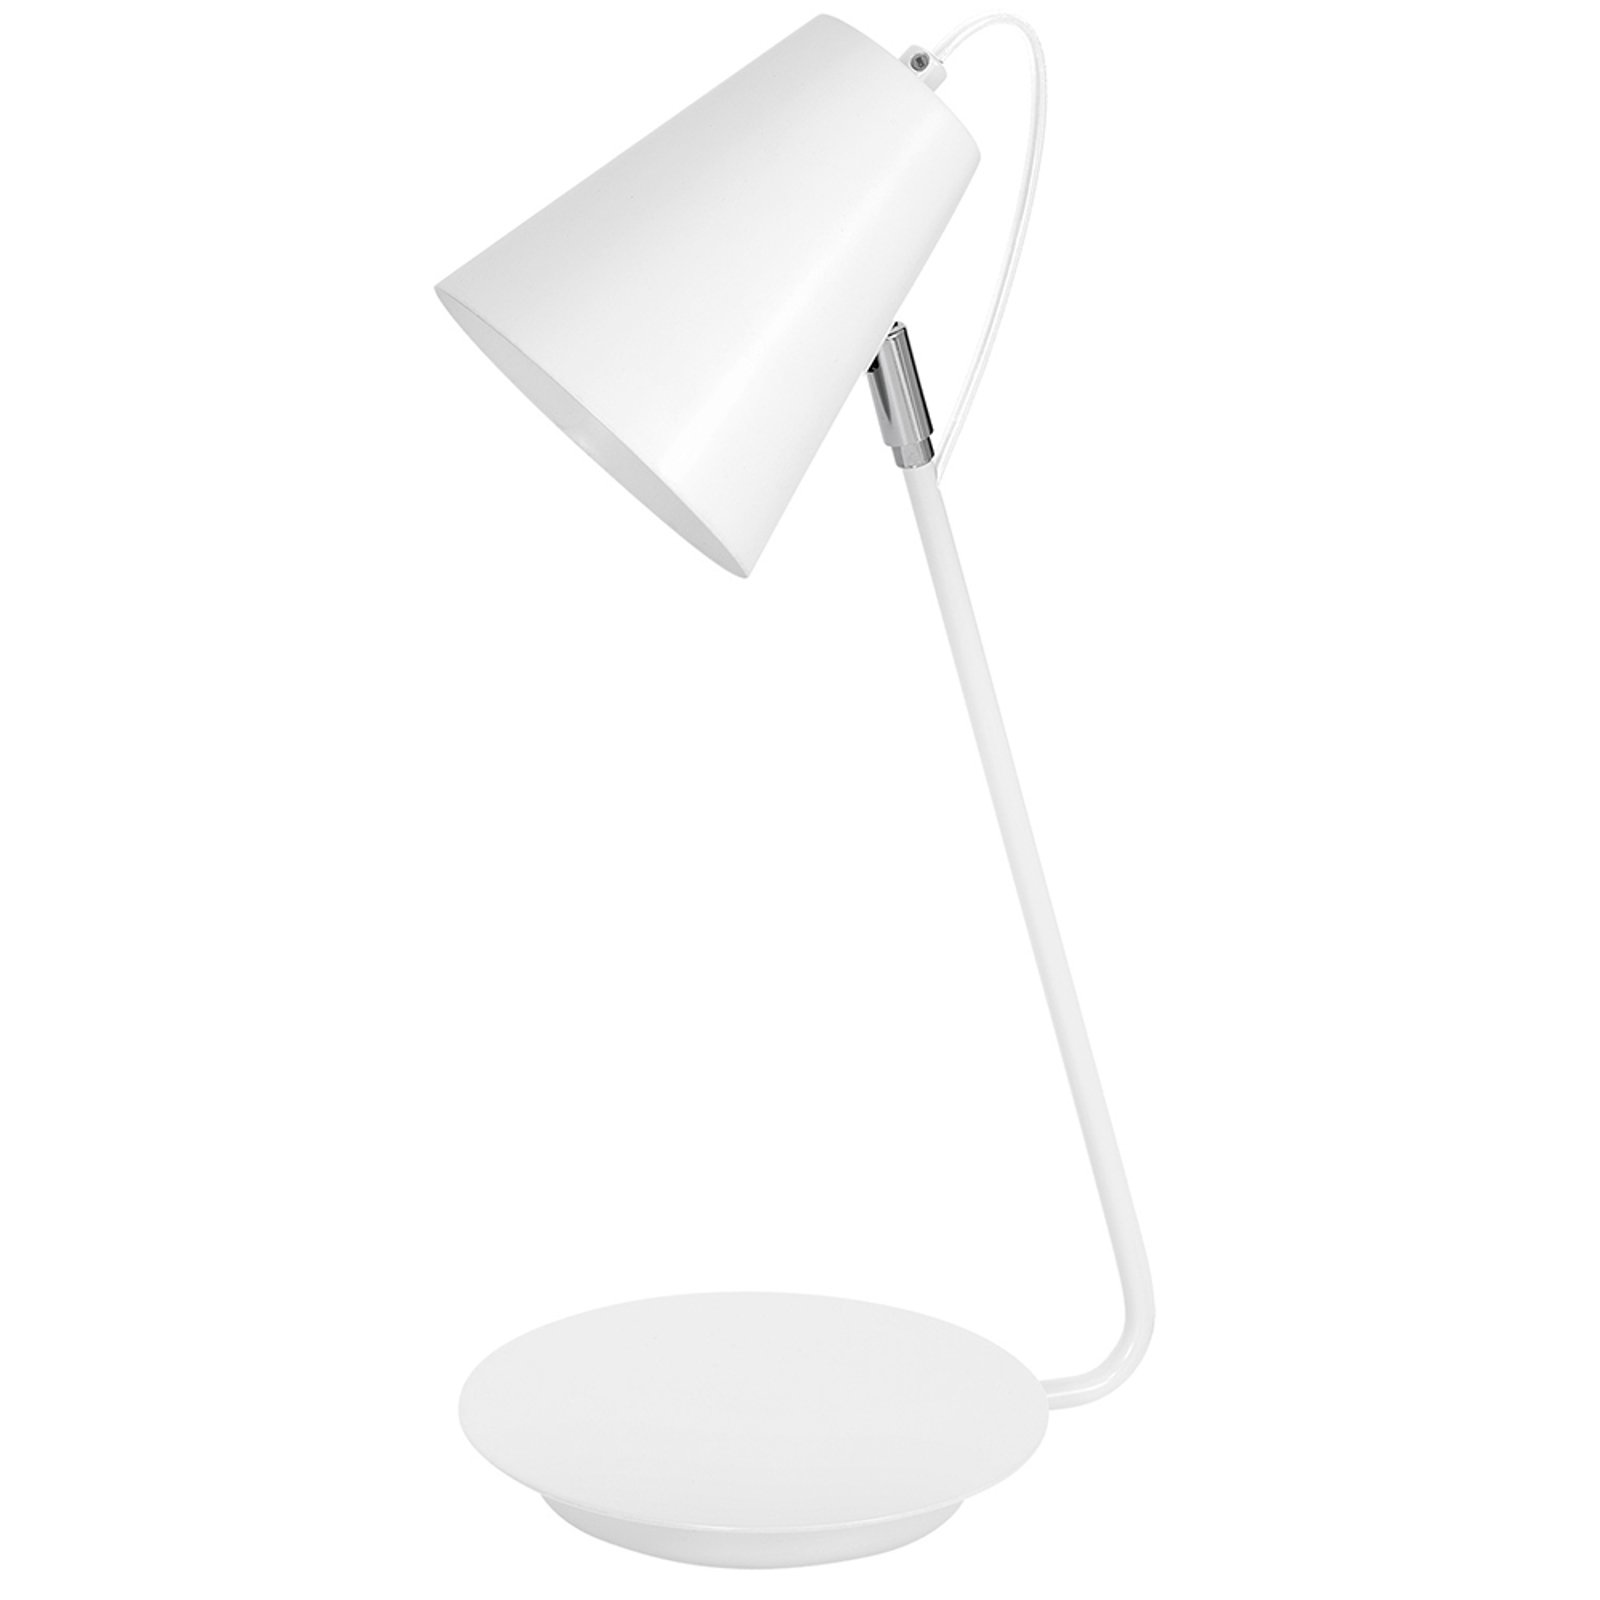 8296 bordlampe konisk krom-detalj, hvit